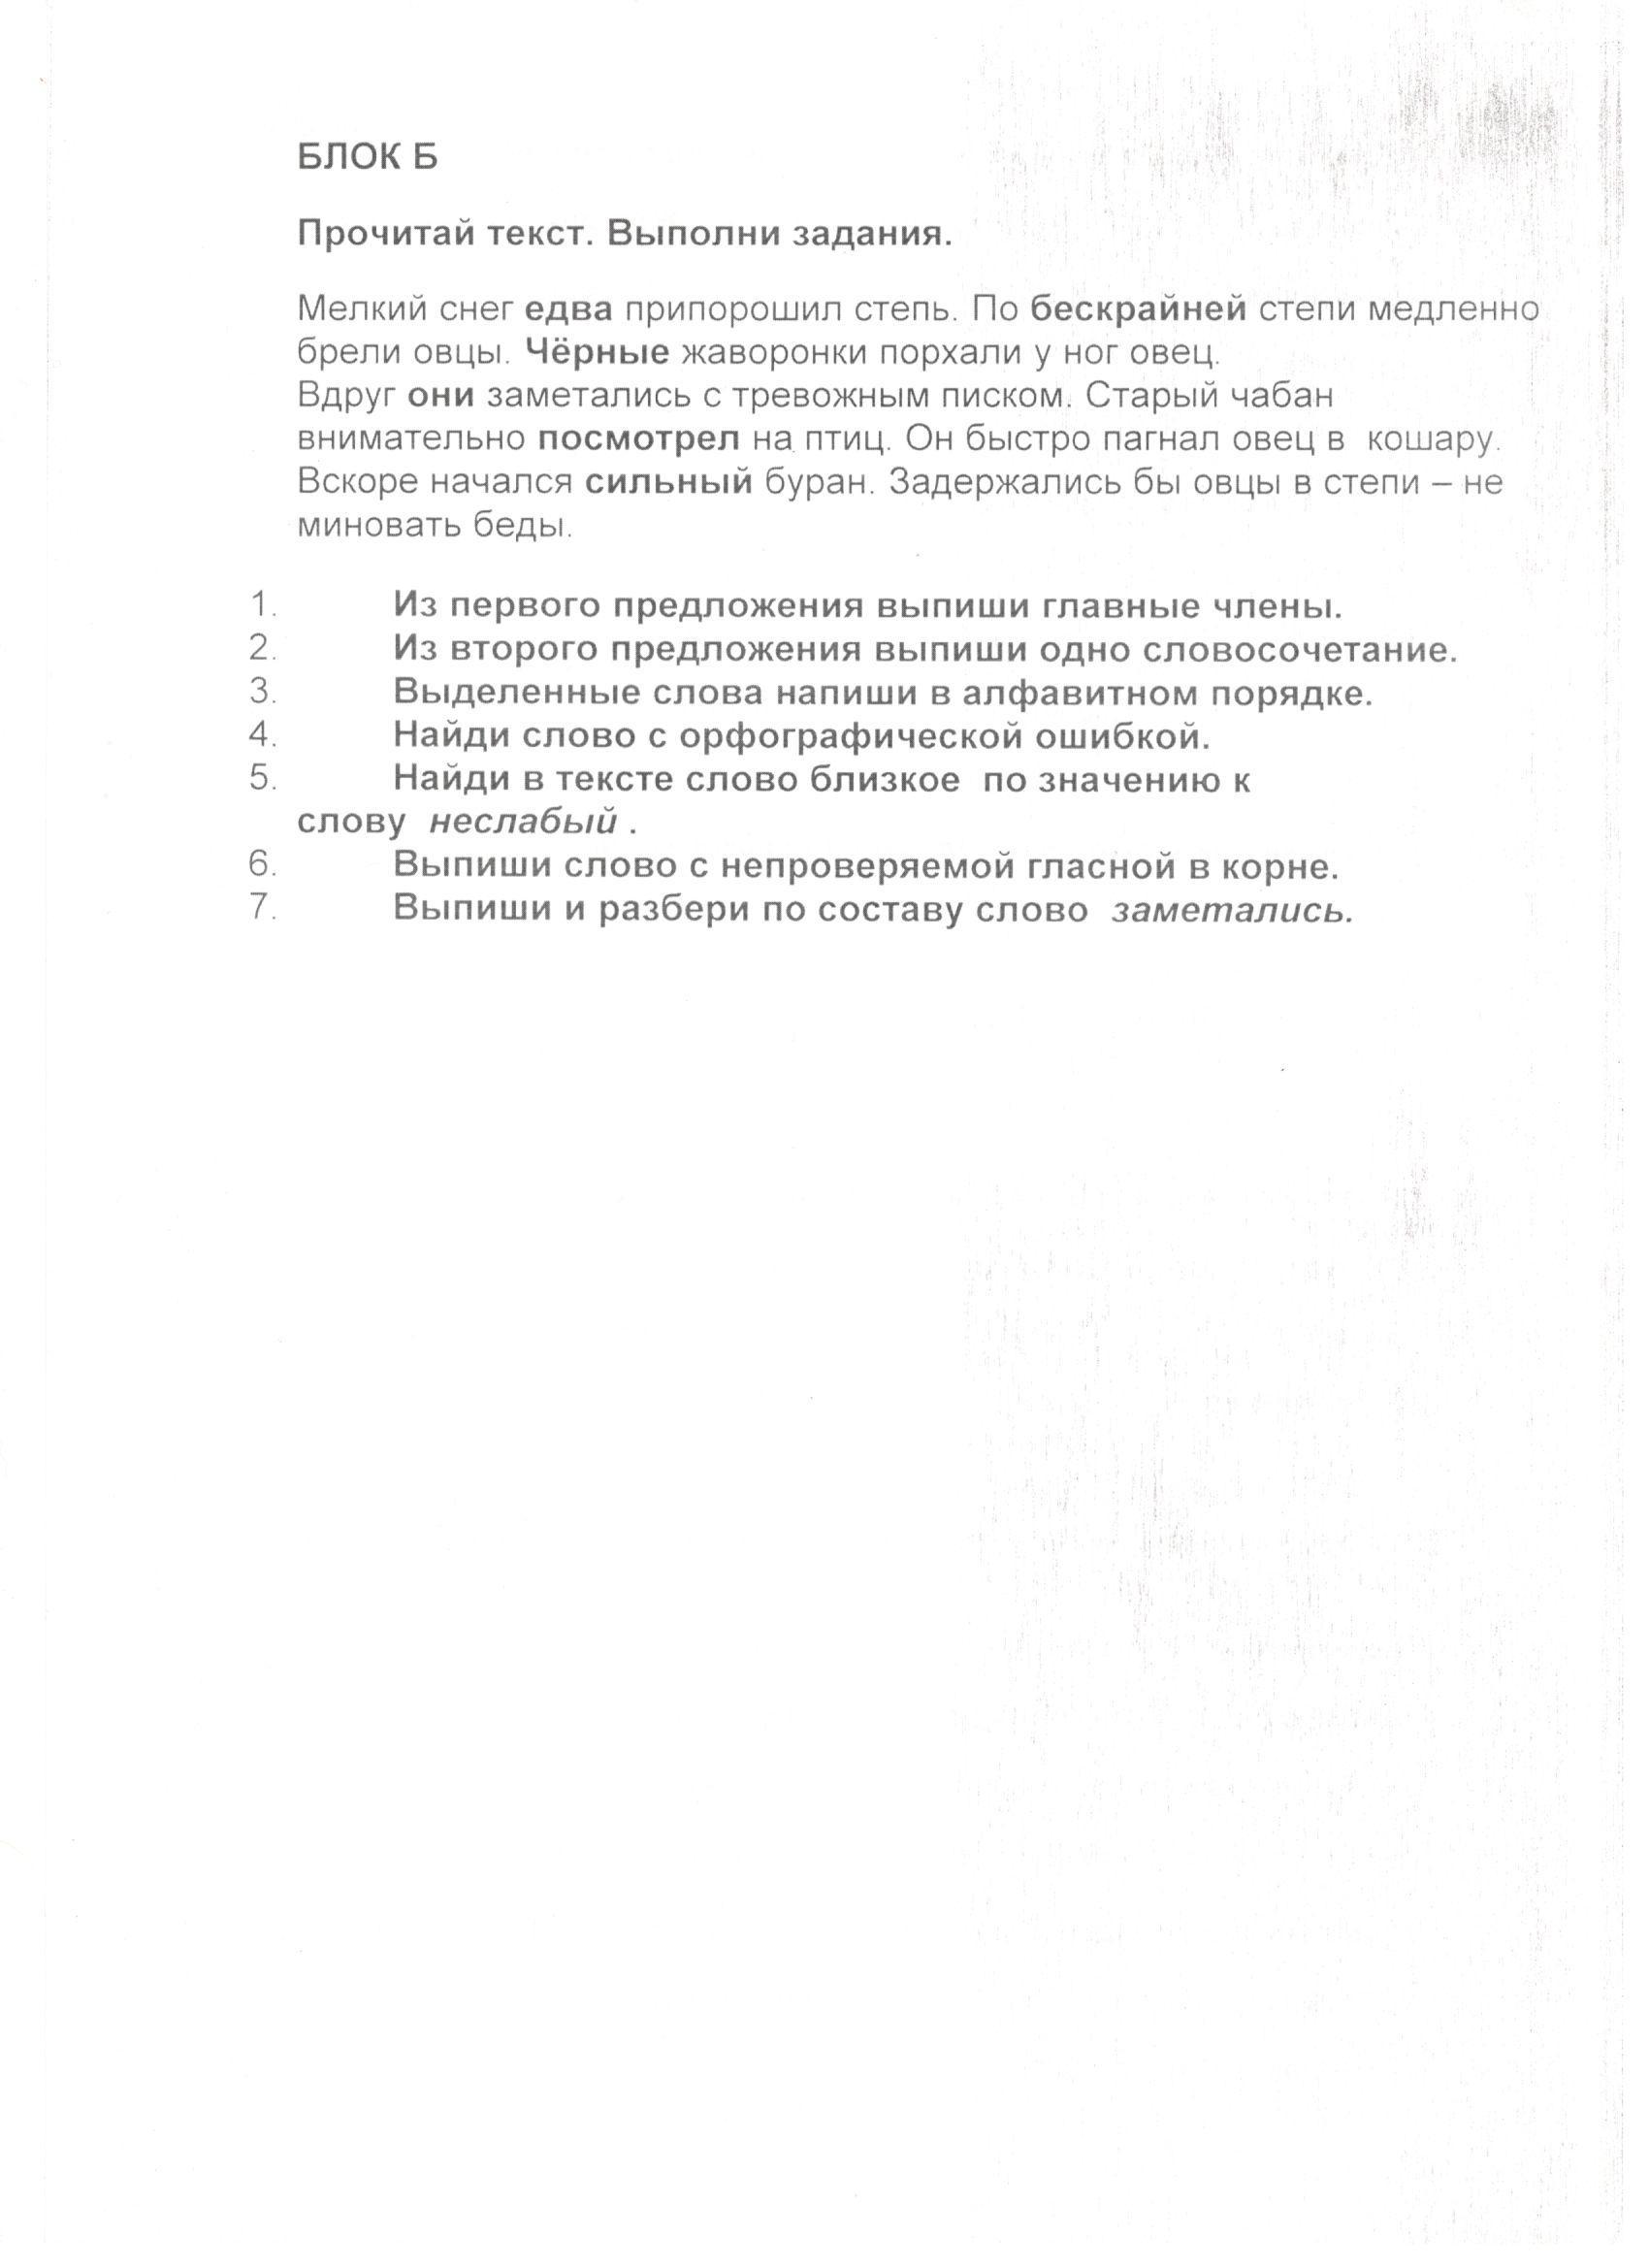 C:\Documents and Settings\user\Мои документы\русский язык 4\блок б.jpg